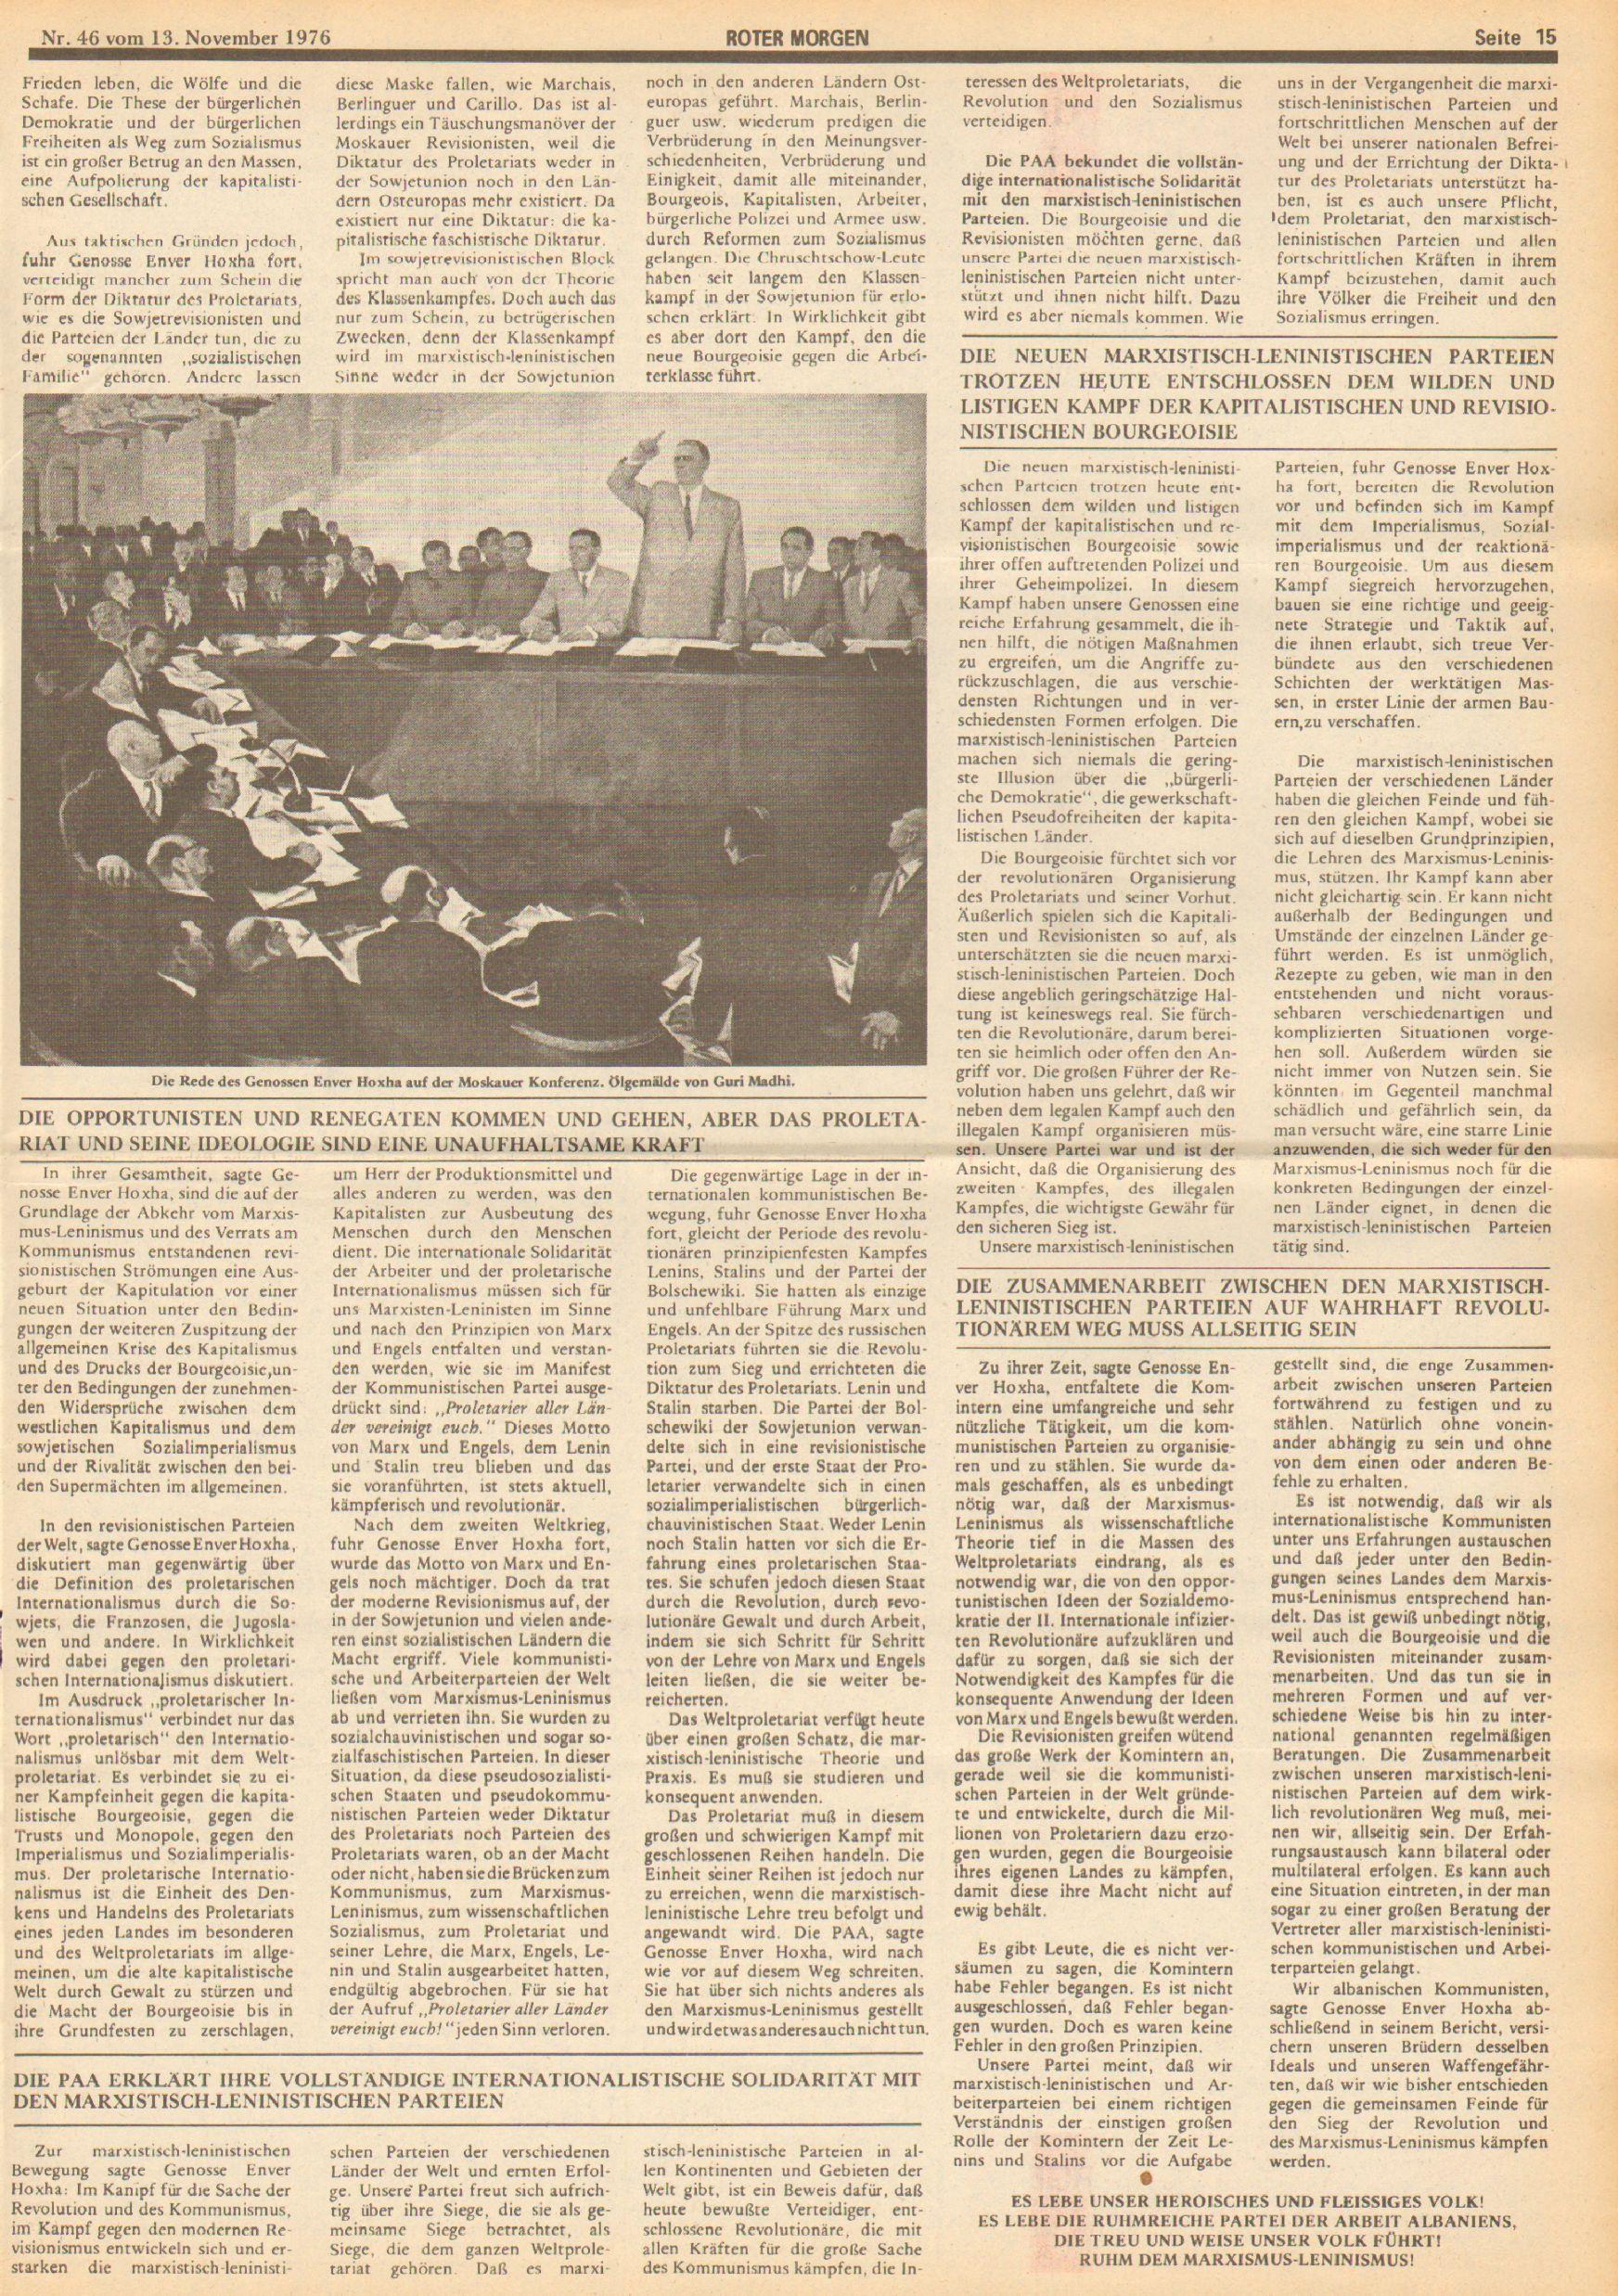 Roter Morgen, 10. Jg., 13. November 1976, Nr. 46, Seite 15